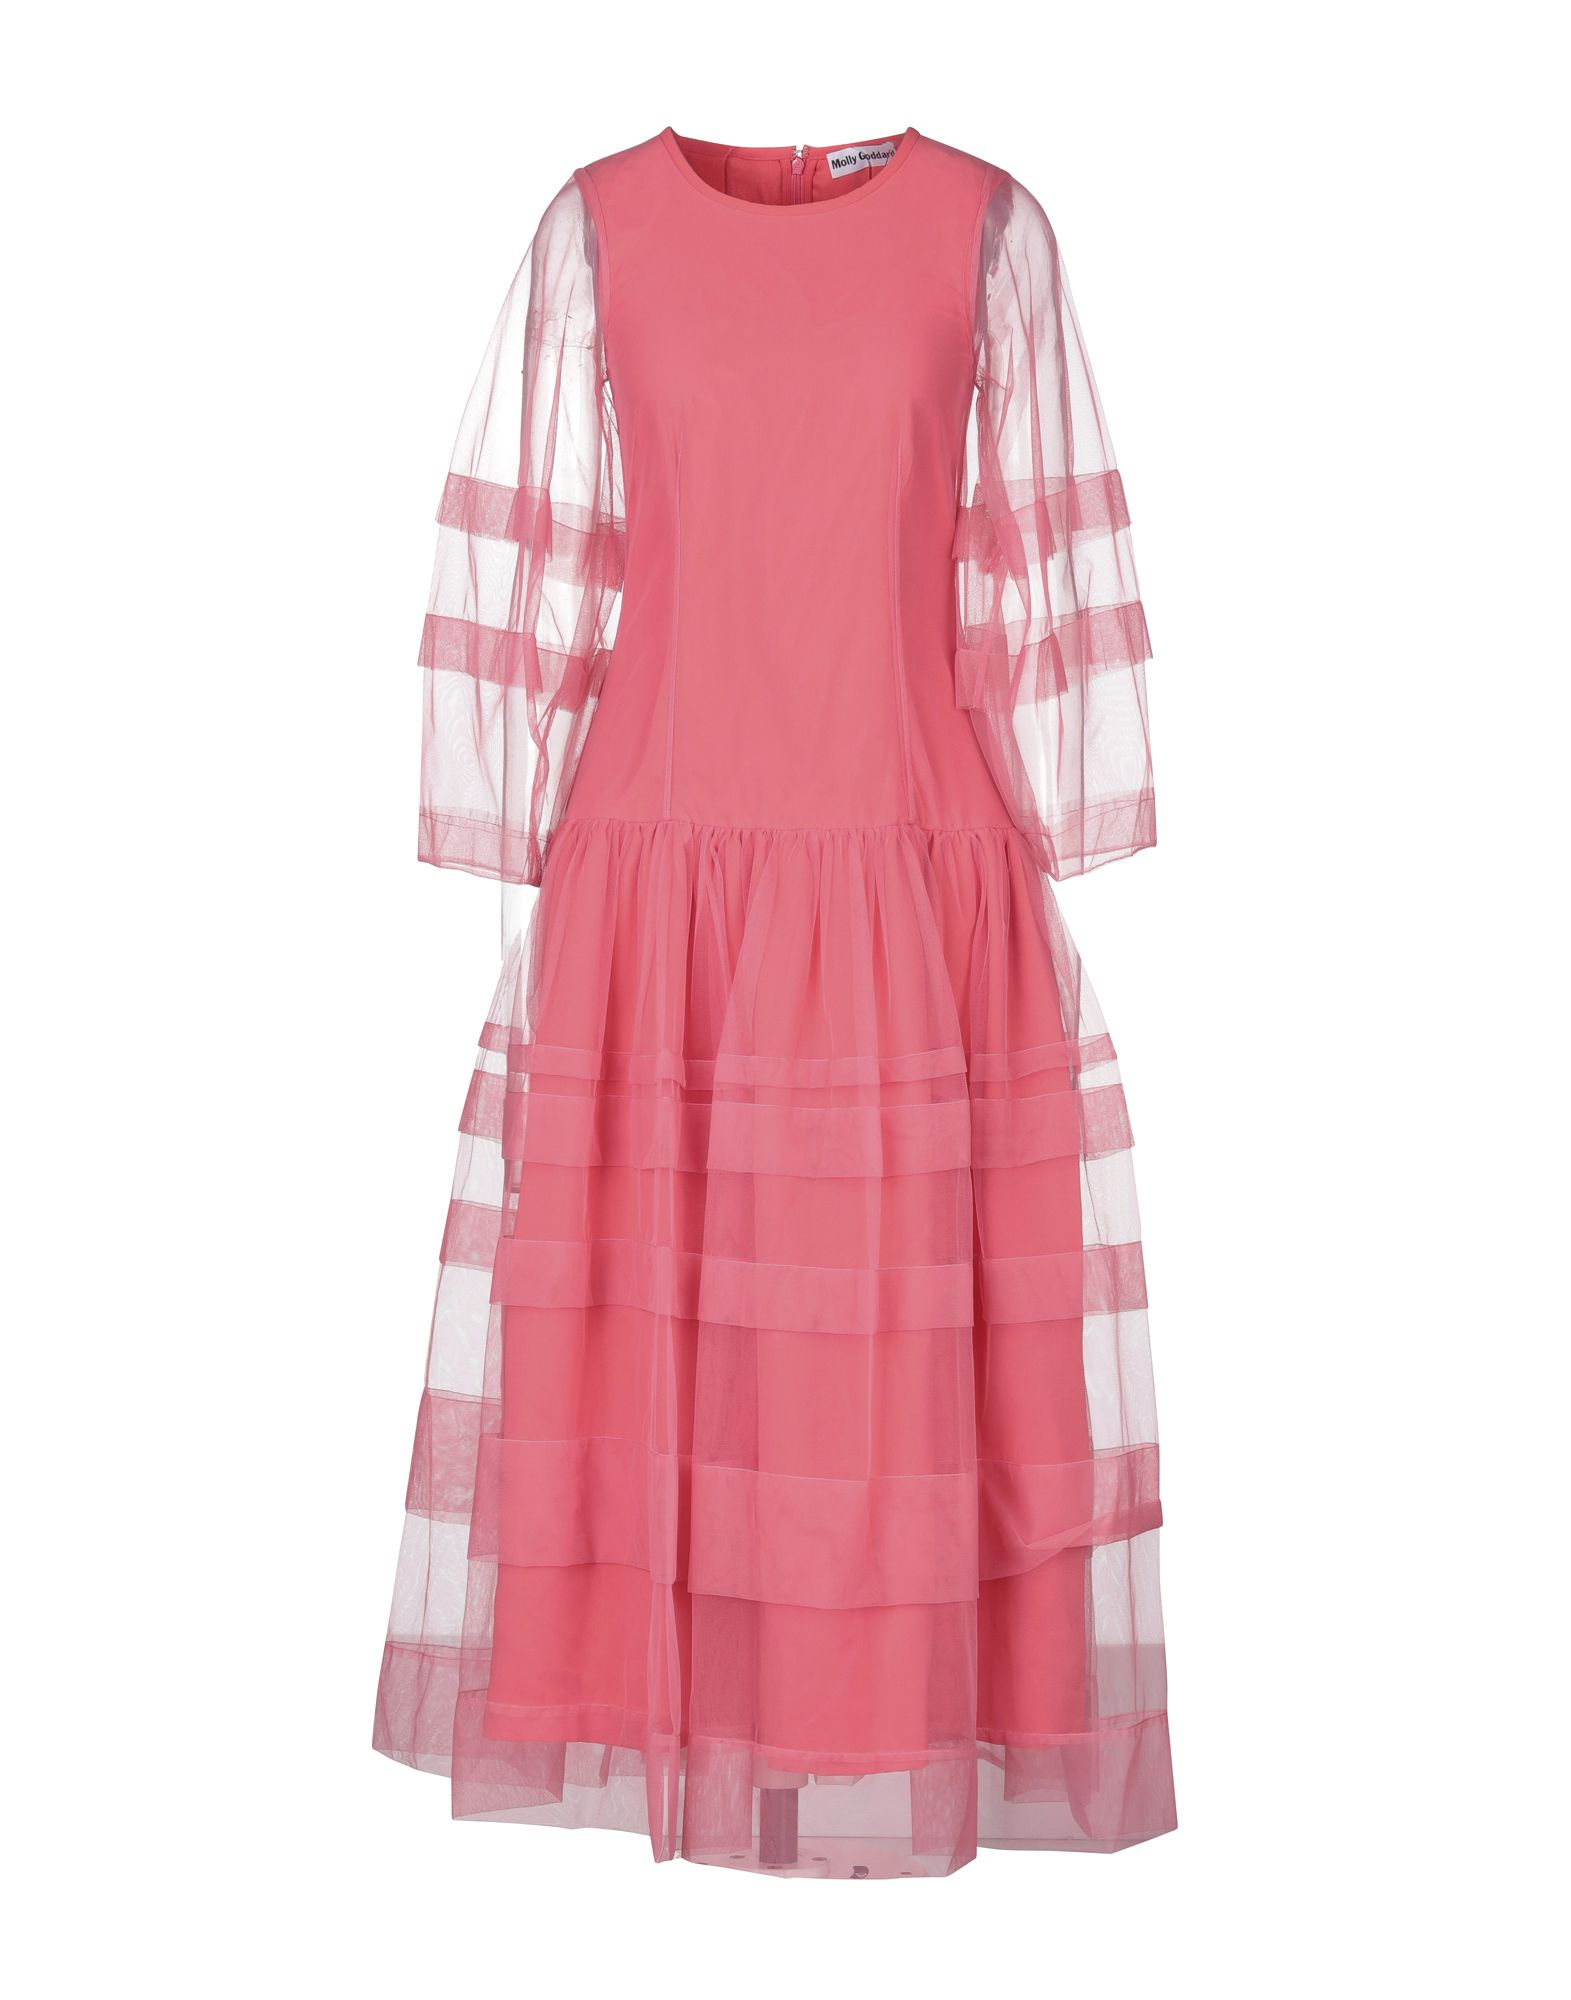 MOLLY GODDARD Платье длиной 3/4